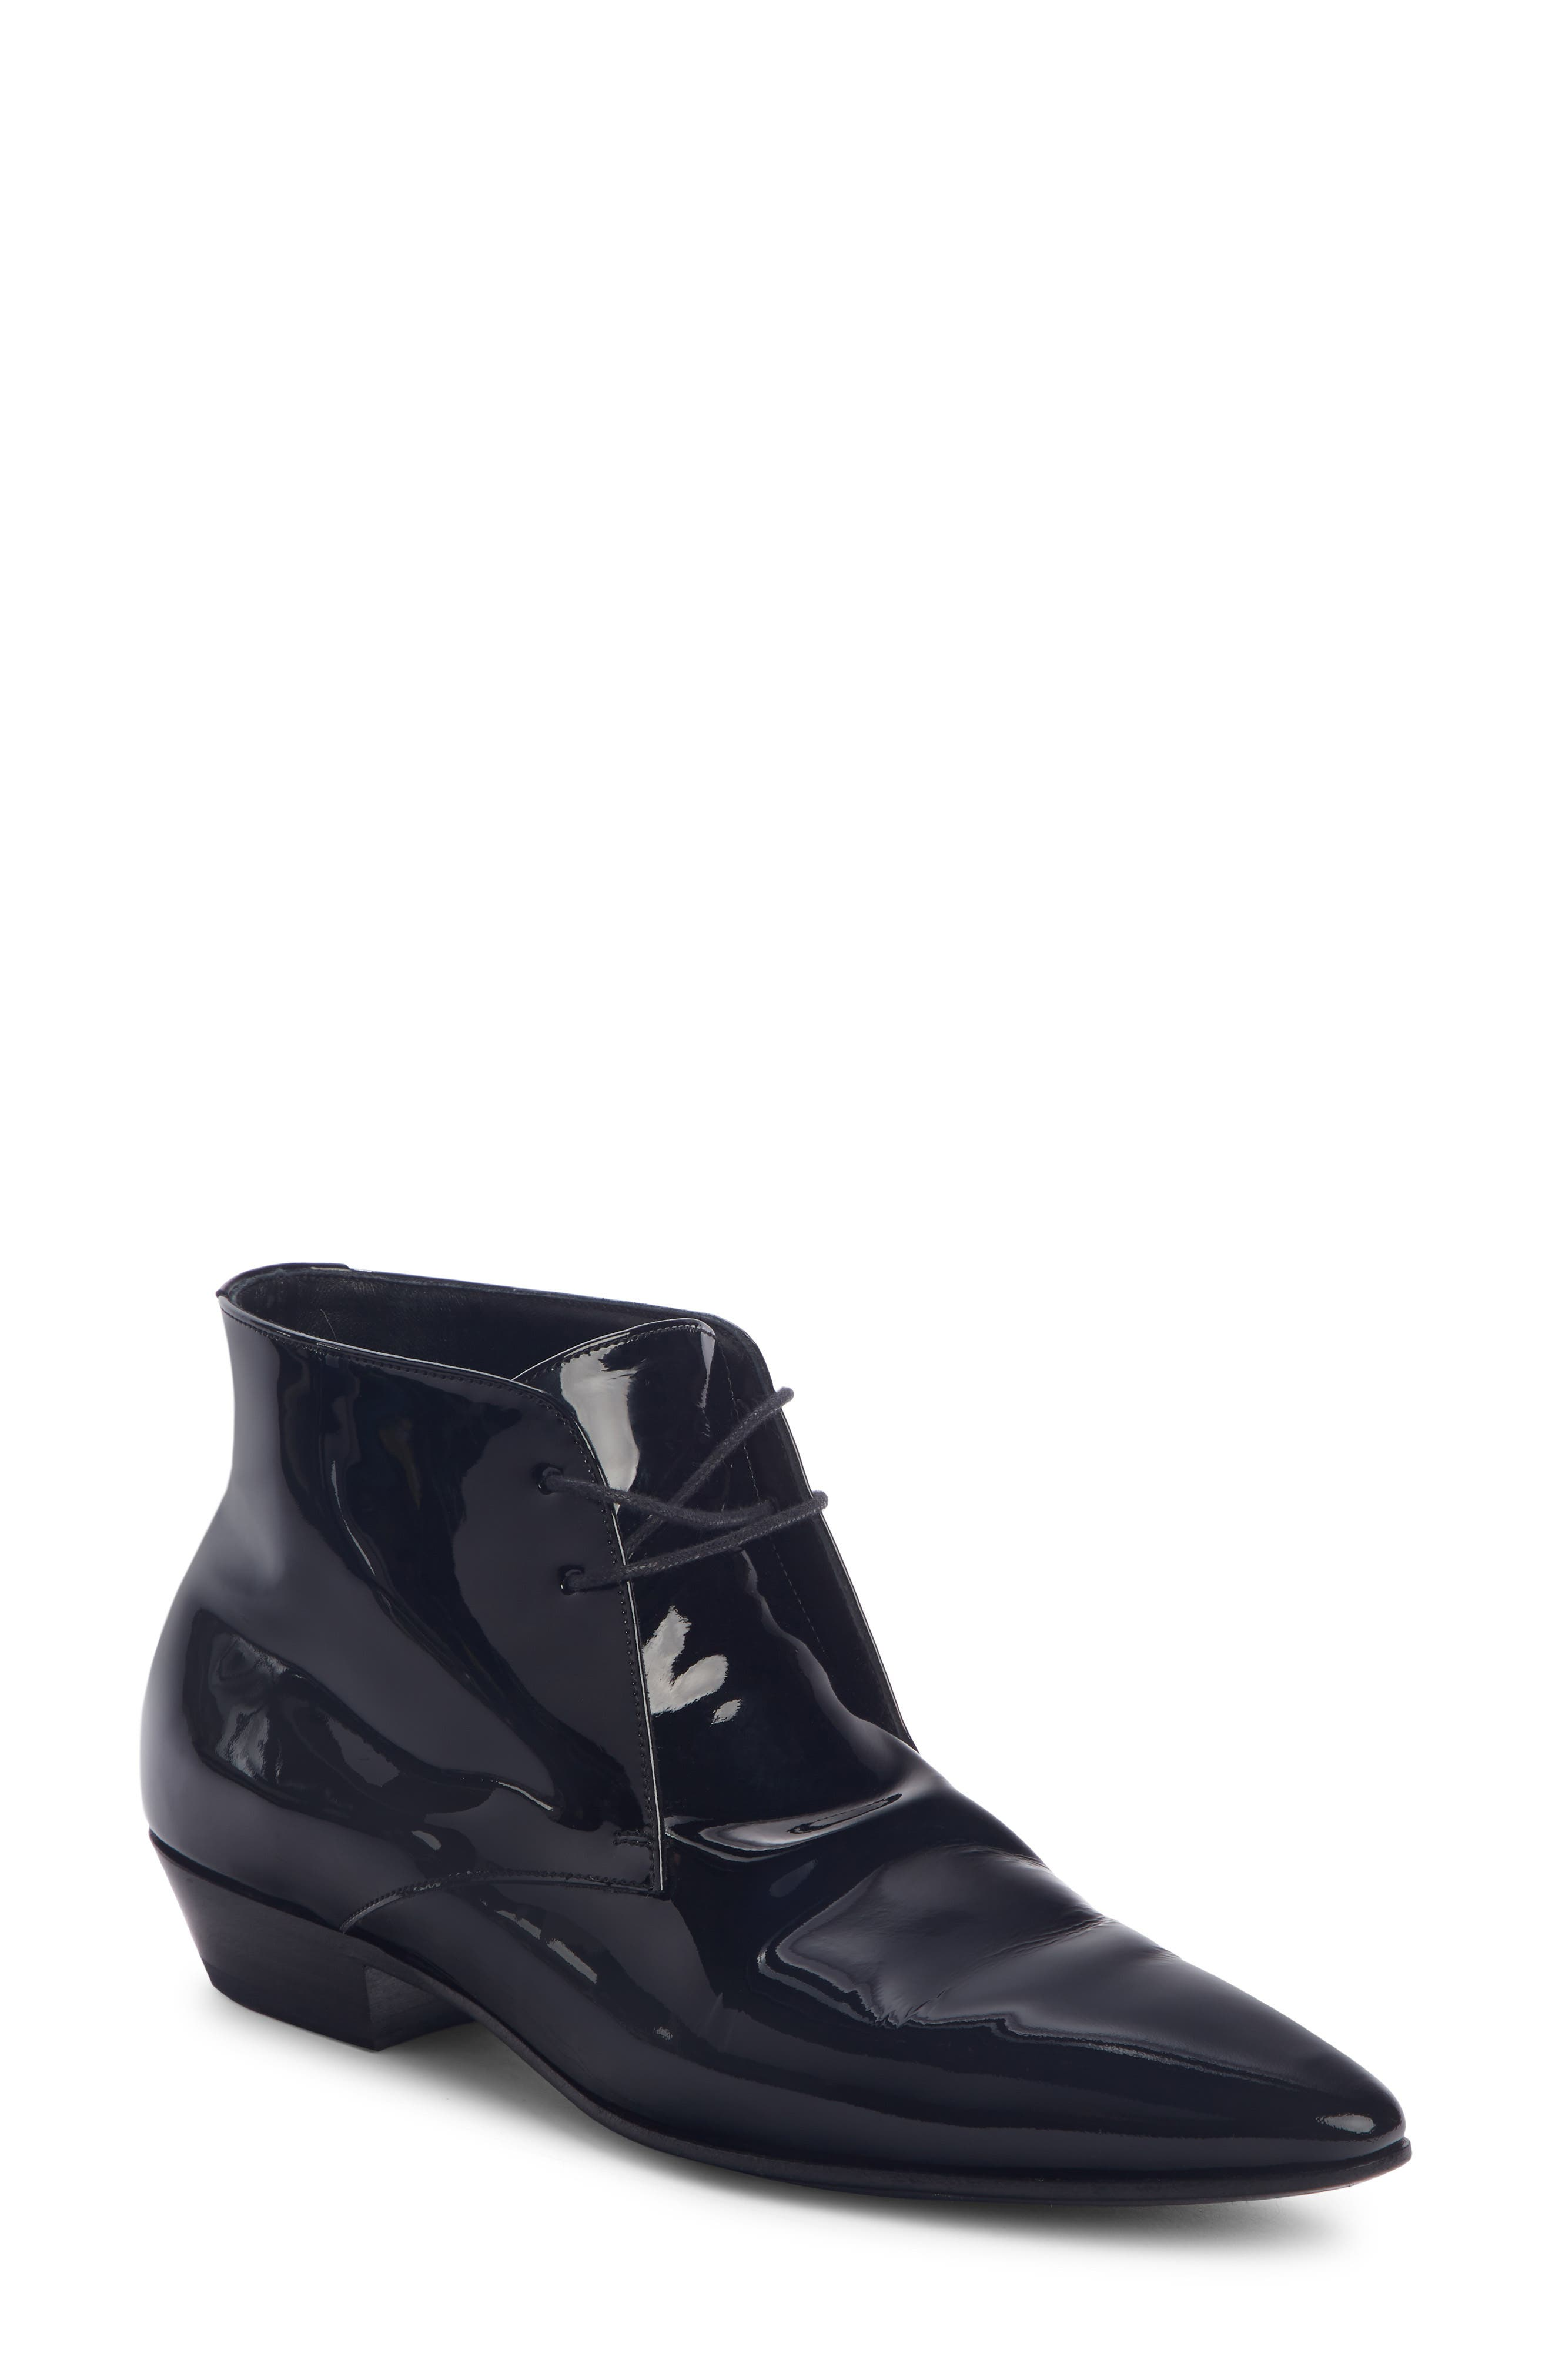 Saint Laurent Jonas Pointy Toe Bootie - Black